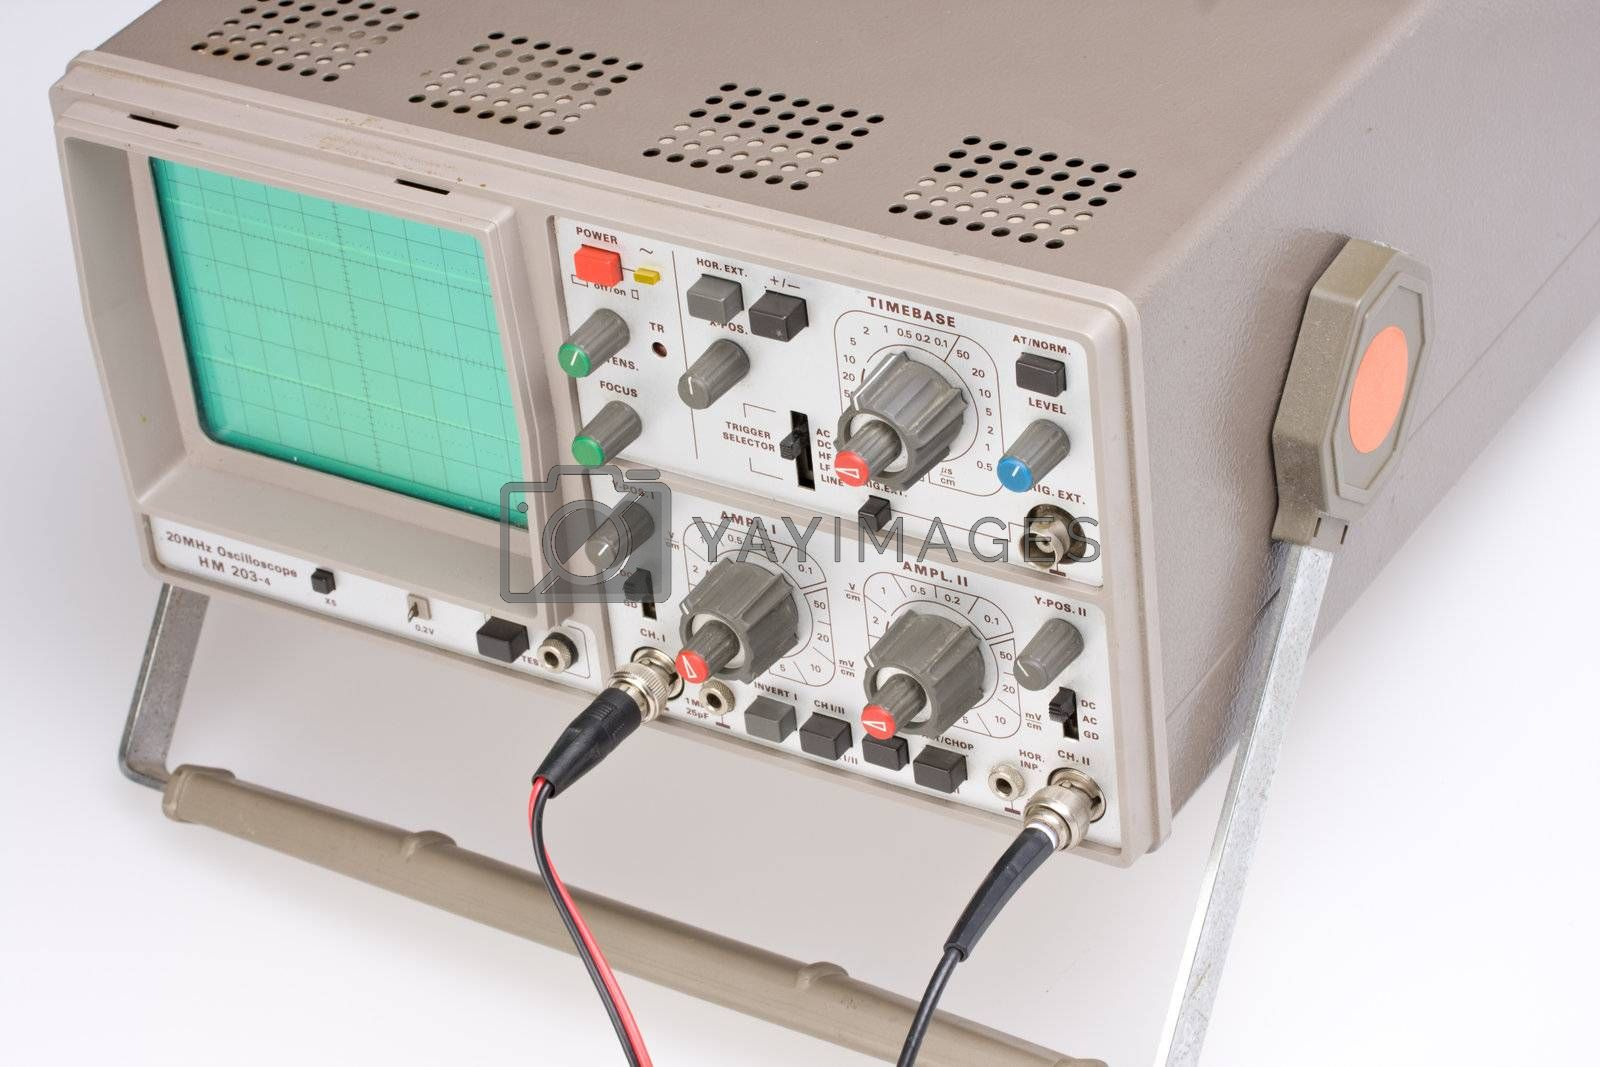 analogue oscilloscope on grey background